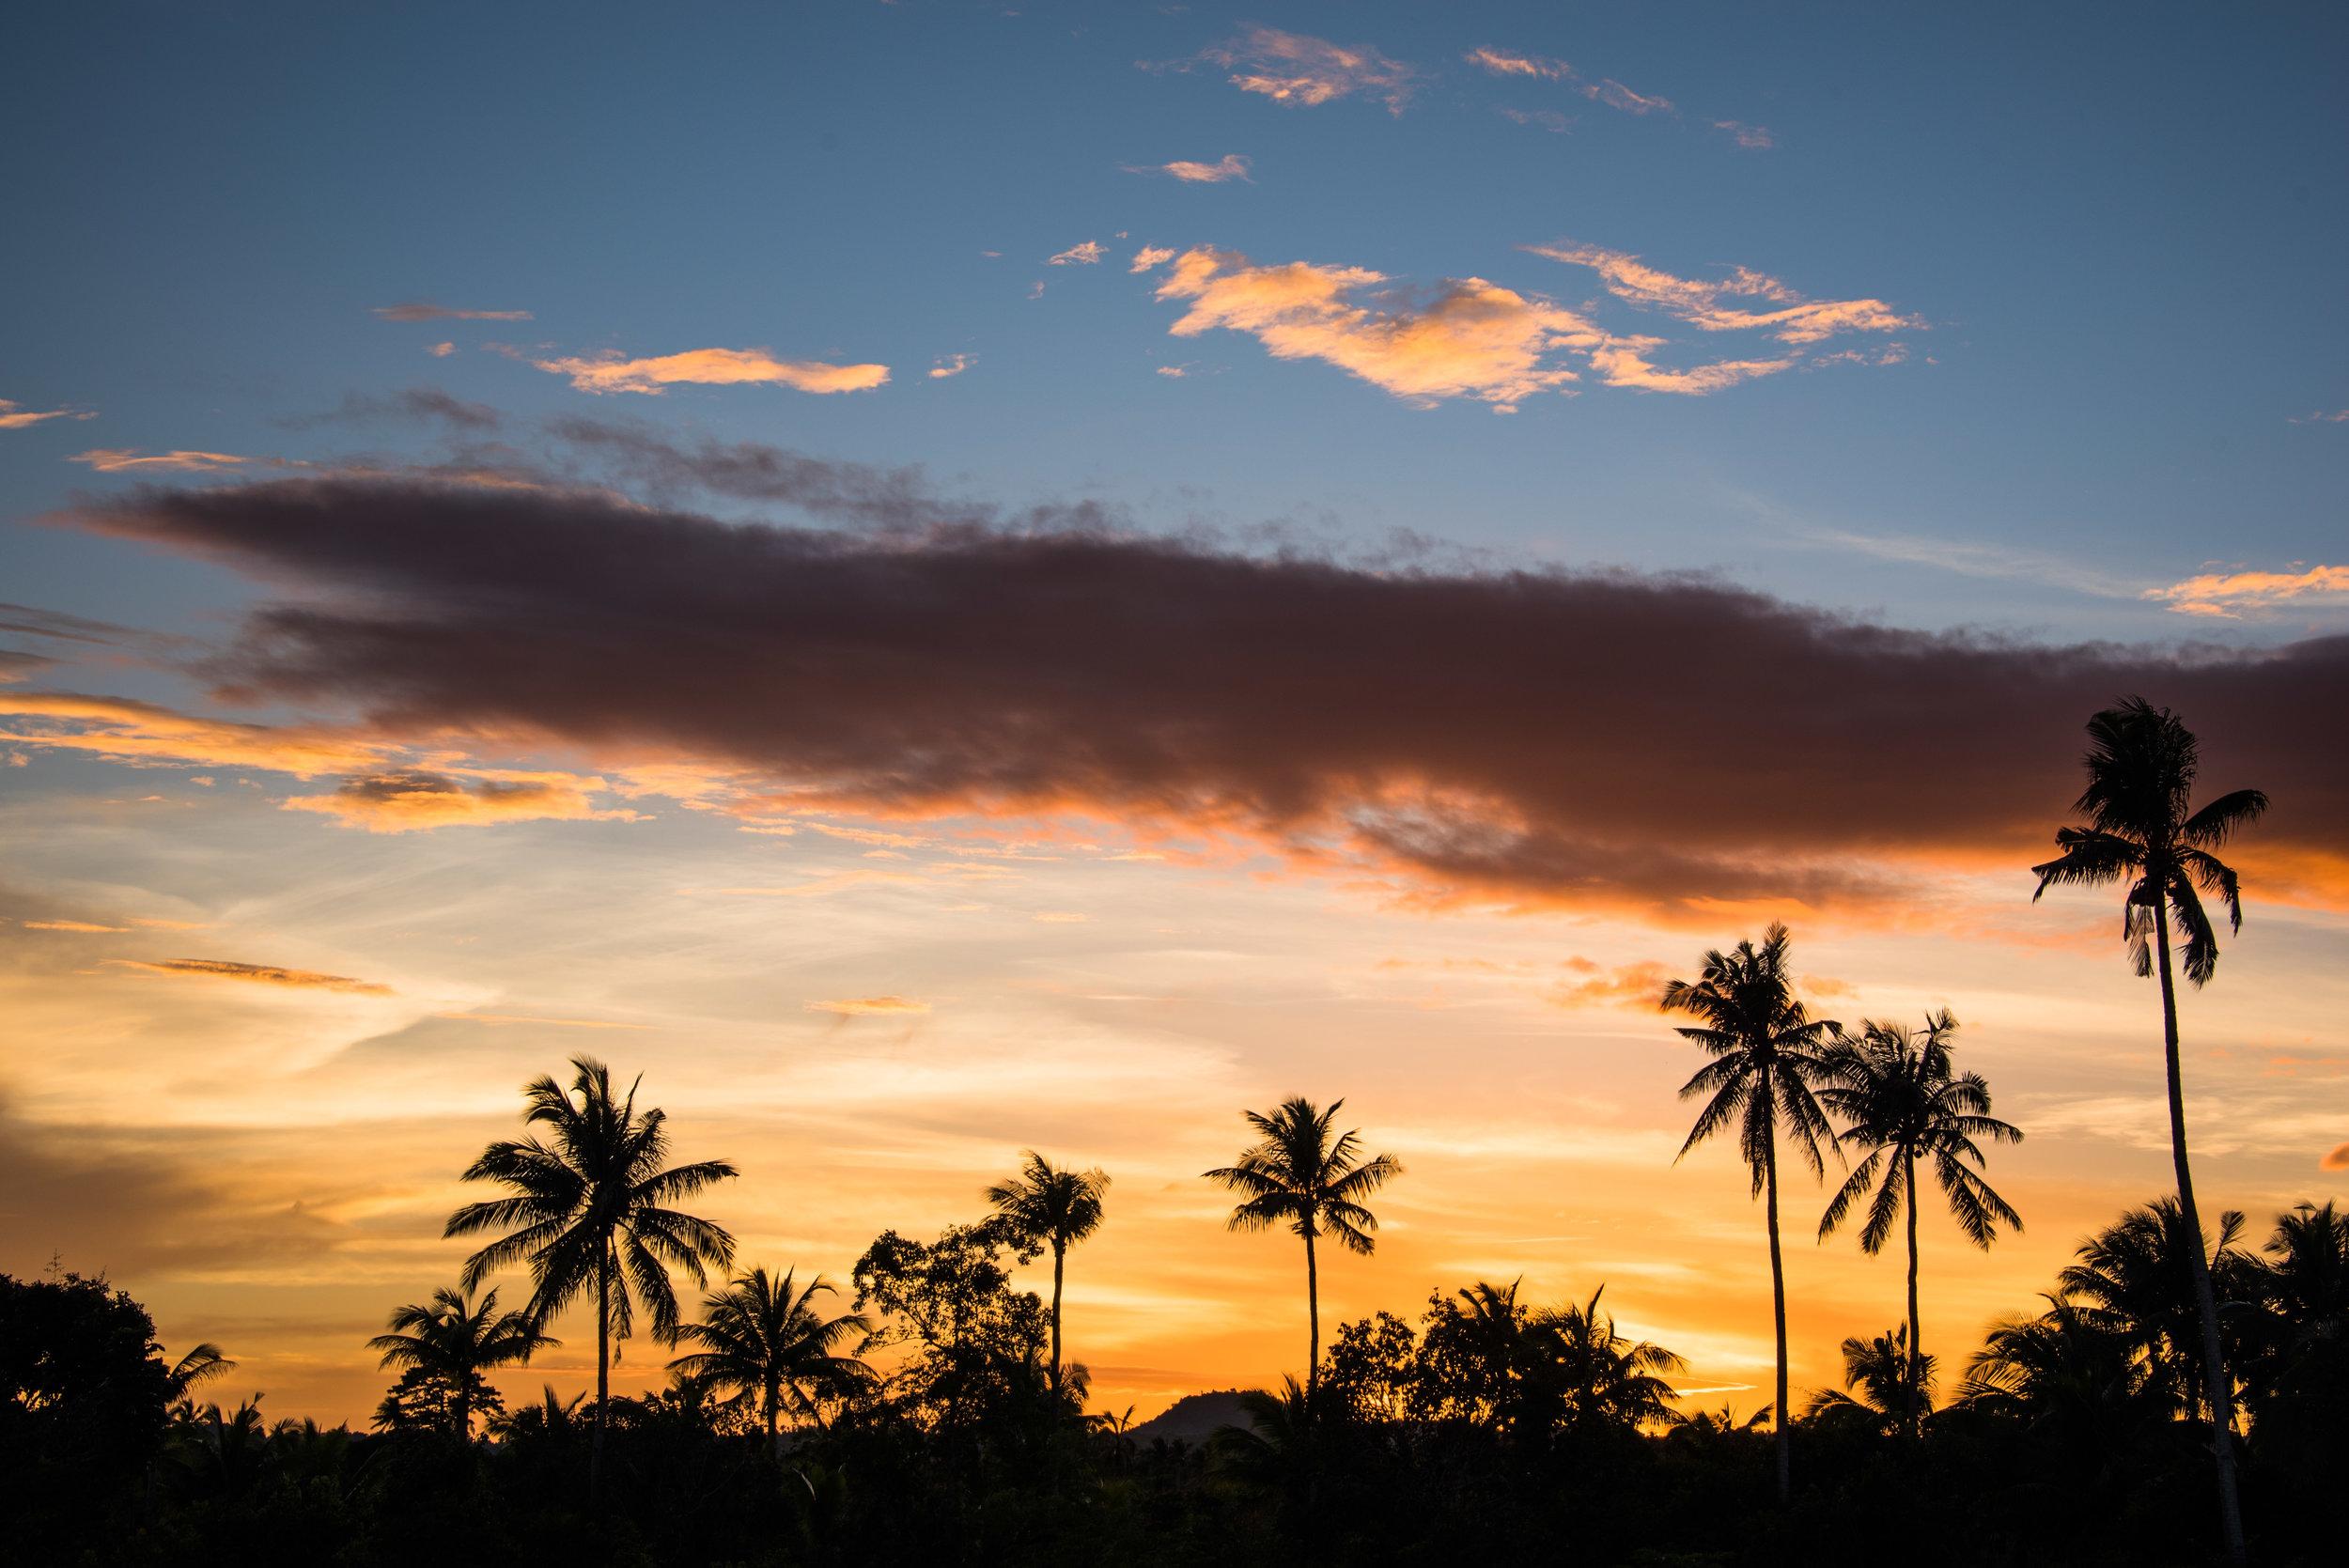 Sunset over Siquijor Island, Philippines